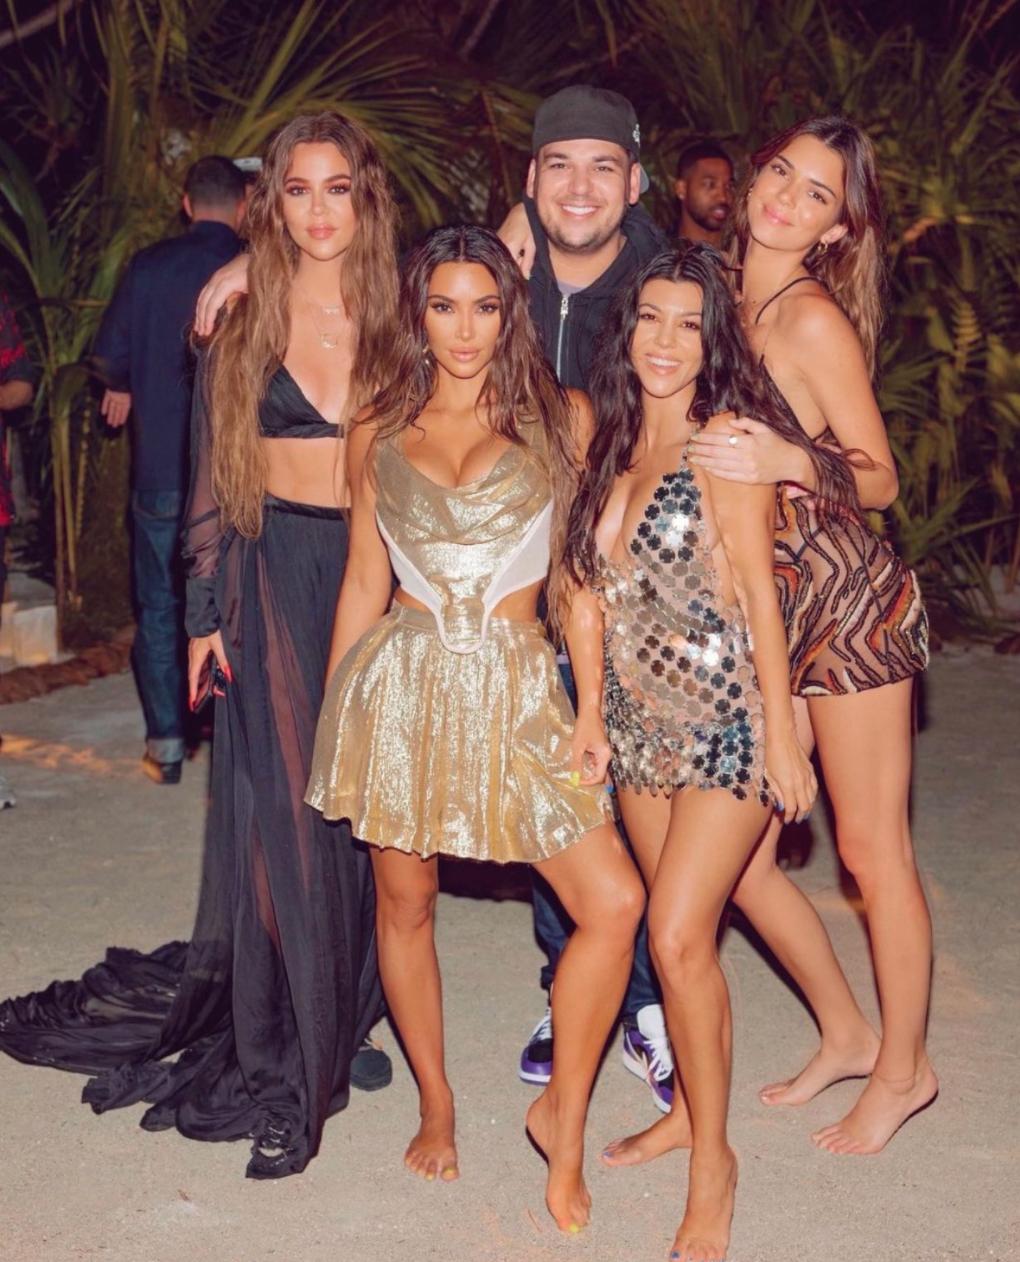 Kim Kardashian, Rob Kardashian, Khloé Kardashian, Kendall Jenner, Kylie Jenner, Kourtney Kardashian